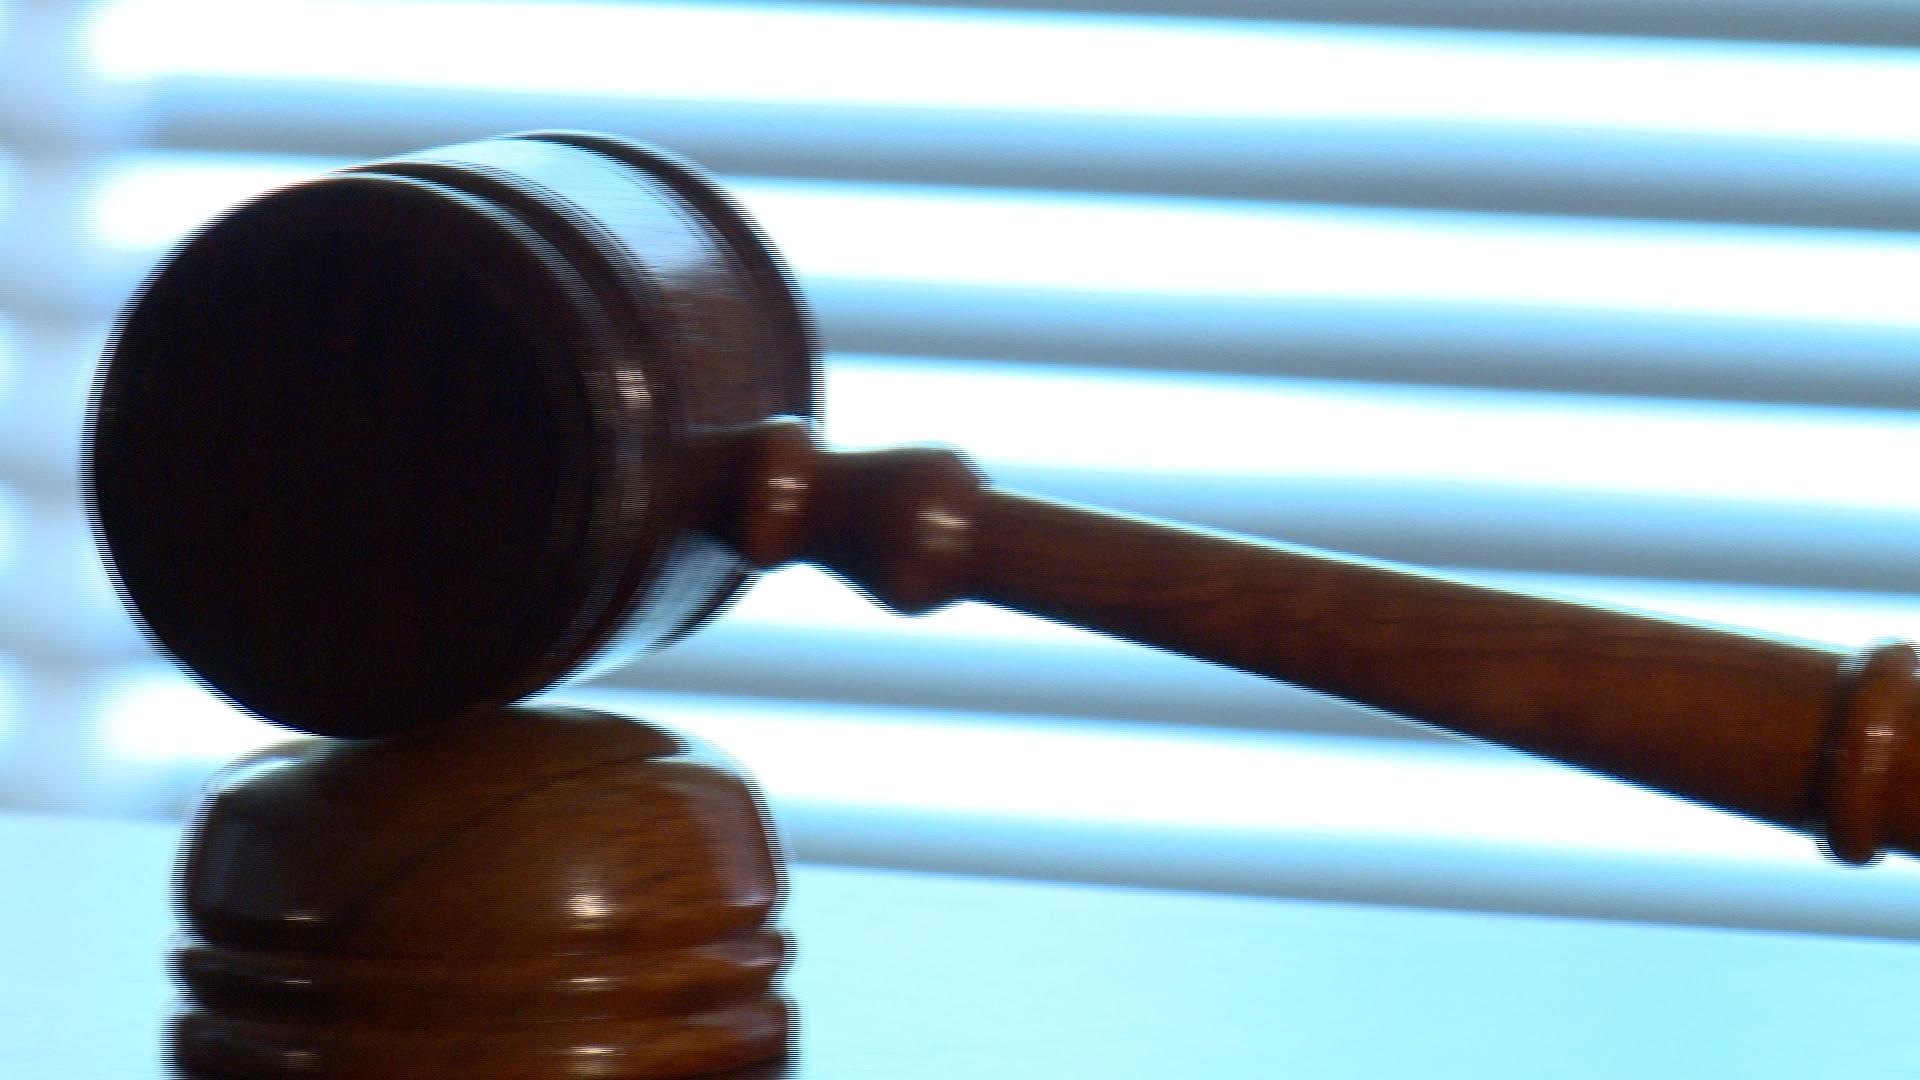 judge gavel_269573-846655081